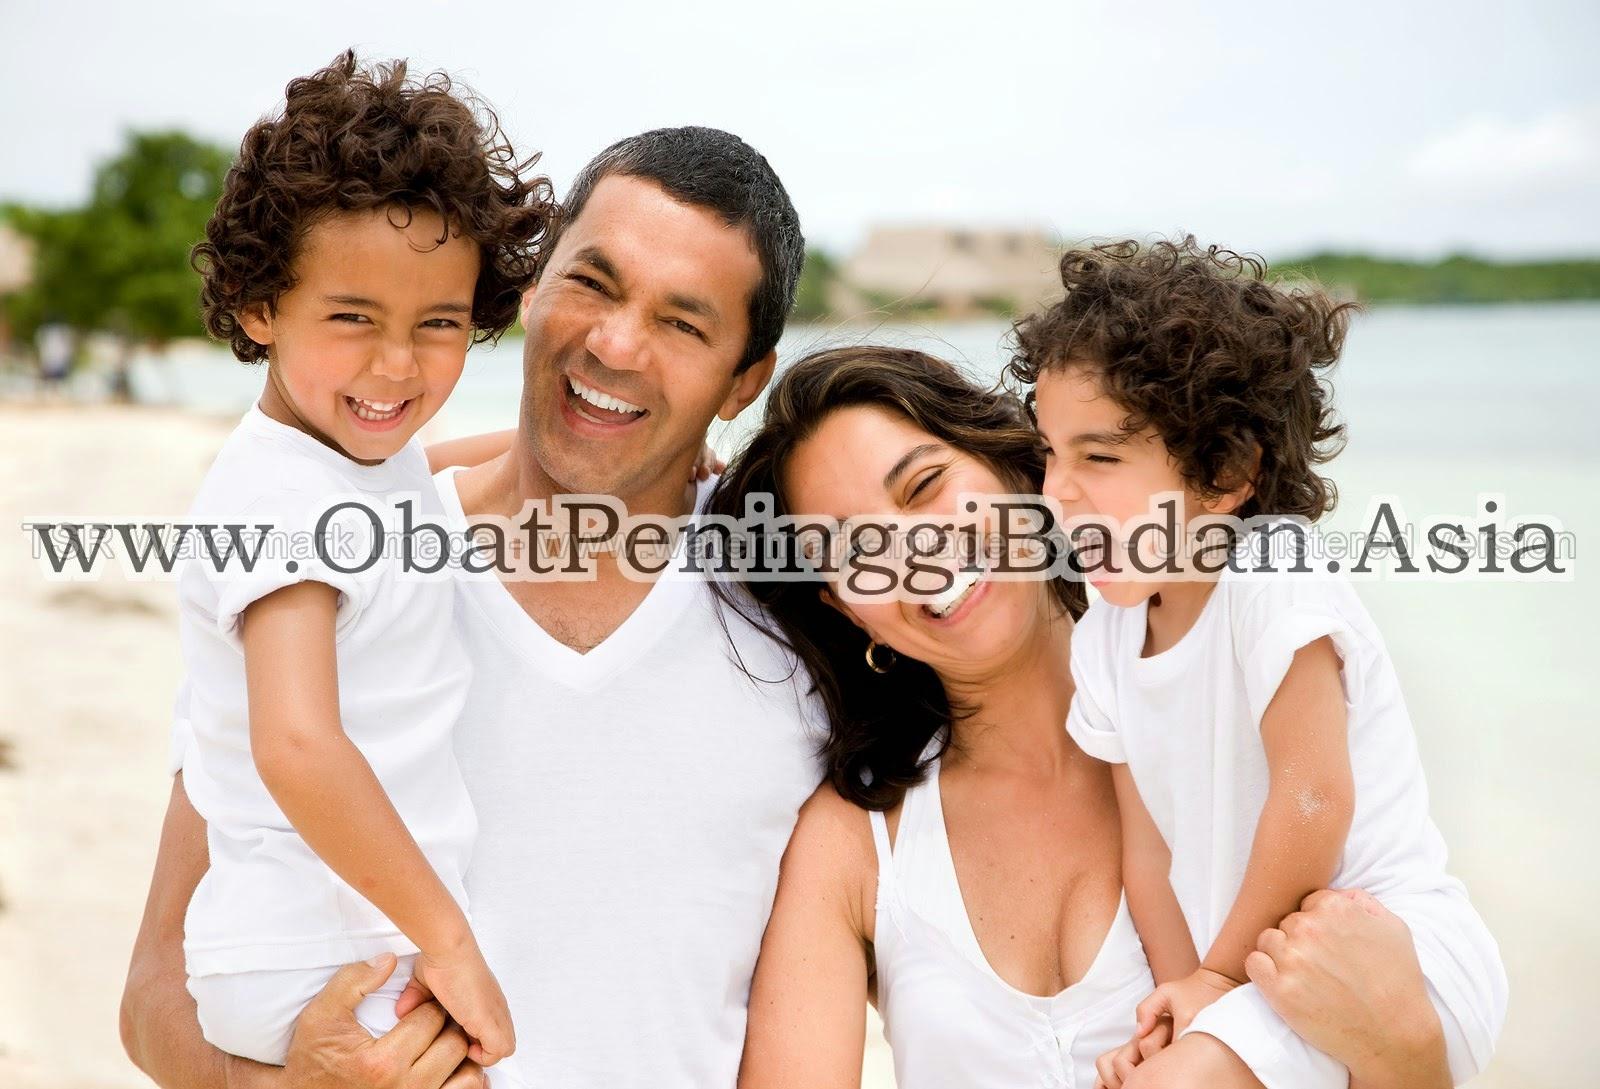 Keluarga Bahagia Senang Sehat Pantai Indonesia Peninggi Badan Tiens Kesehatan Penting Ayah Ibu Anak Pantai Susu Kalsium NHCP Zinc Spirulina Glucosamine Promo Tiens 2015